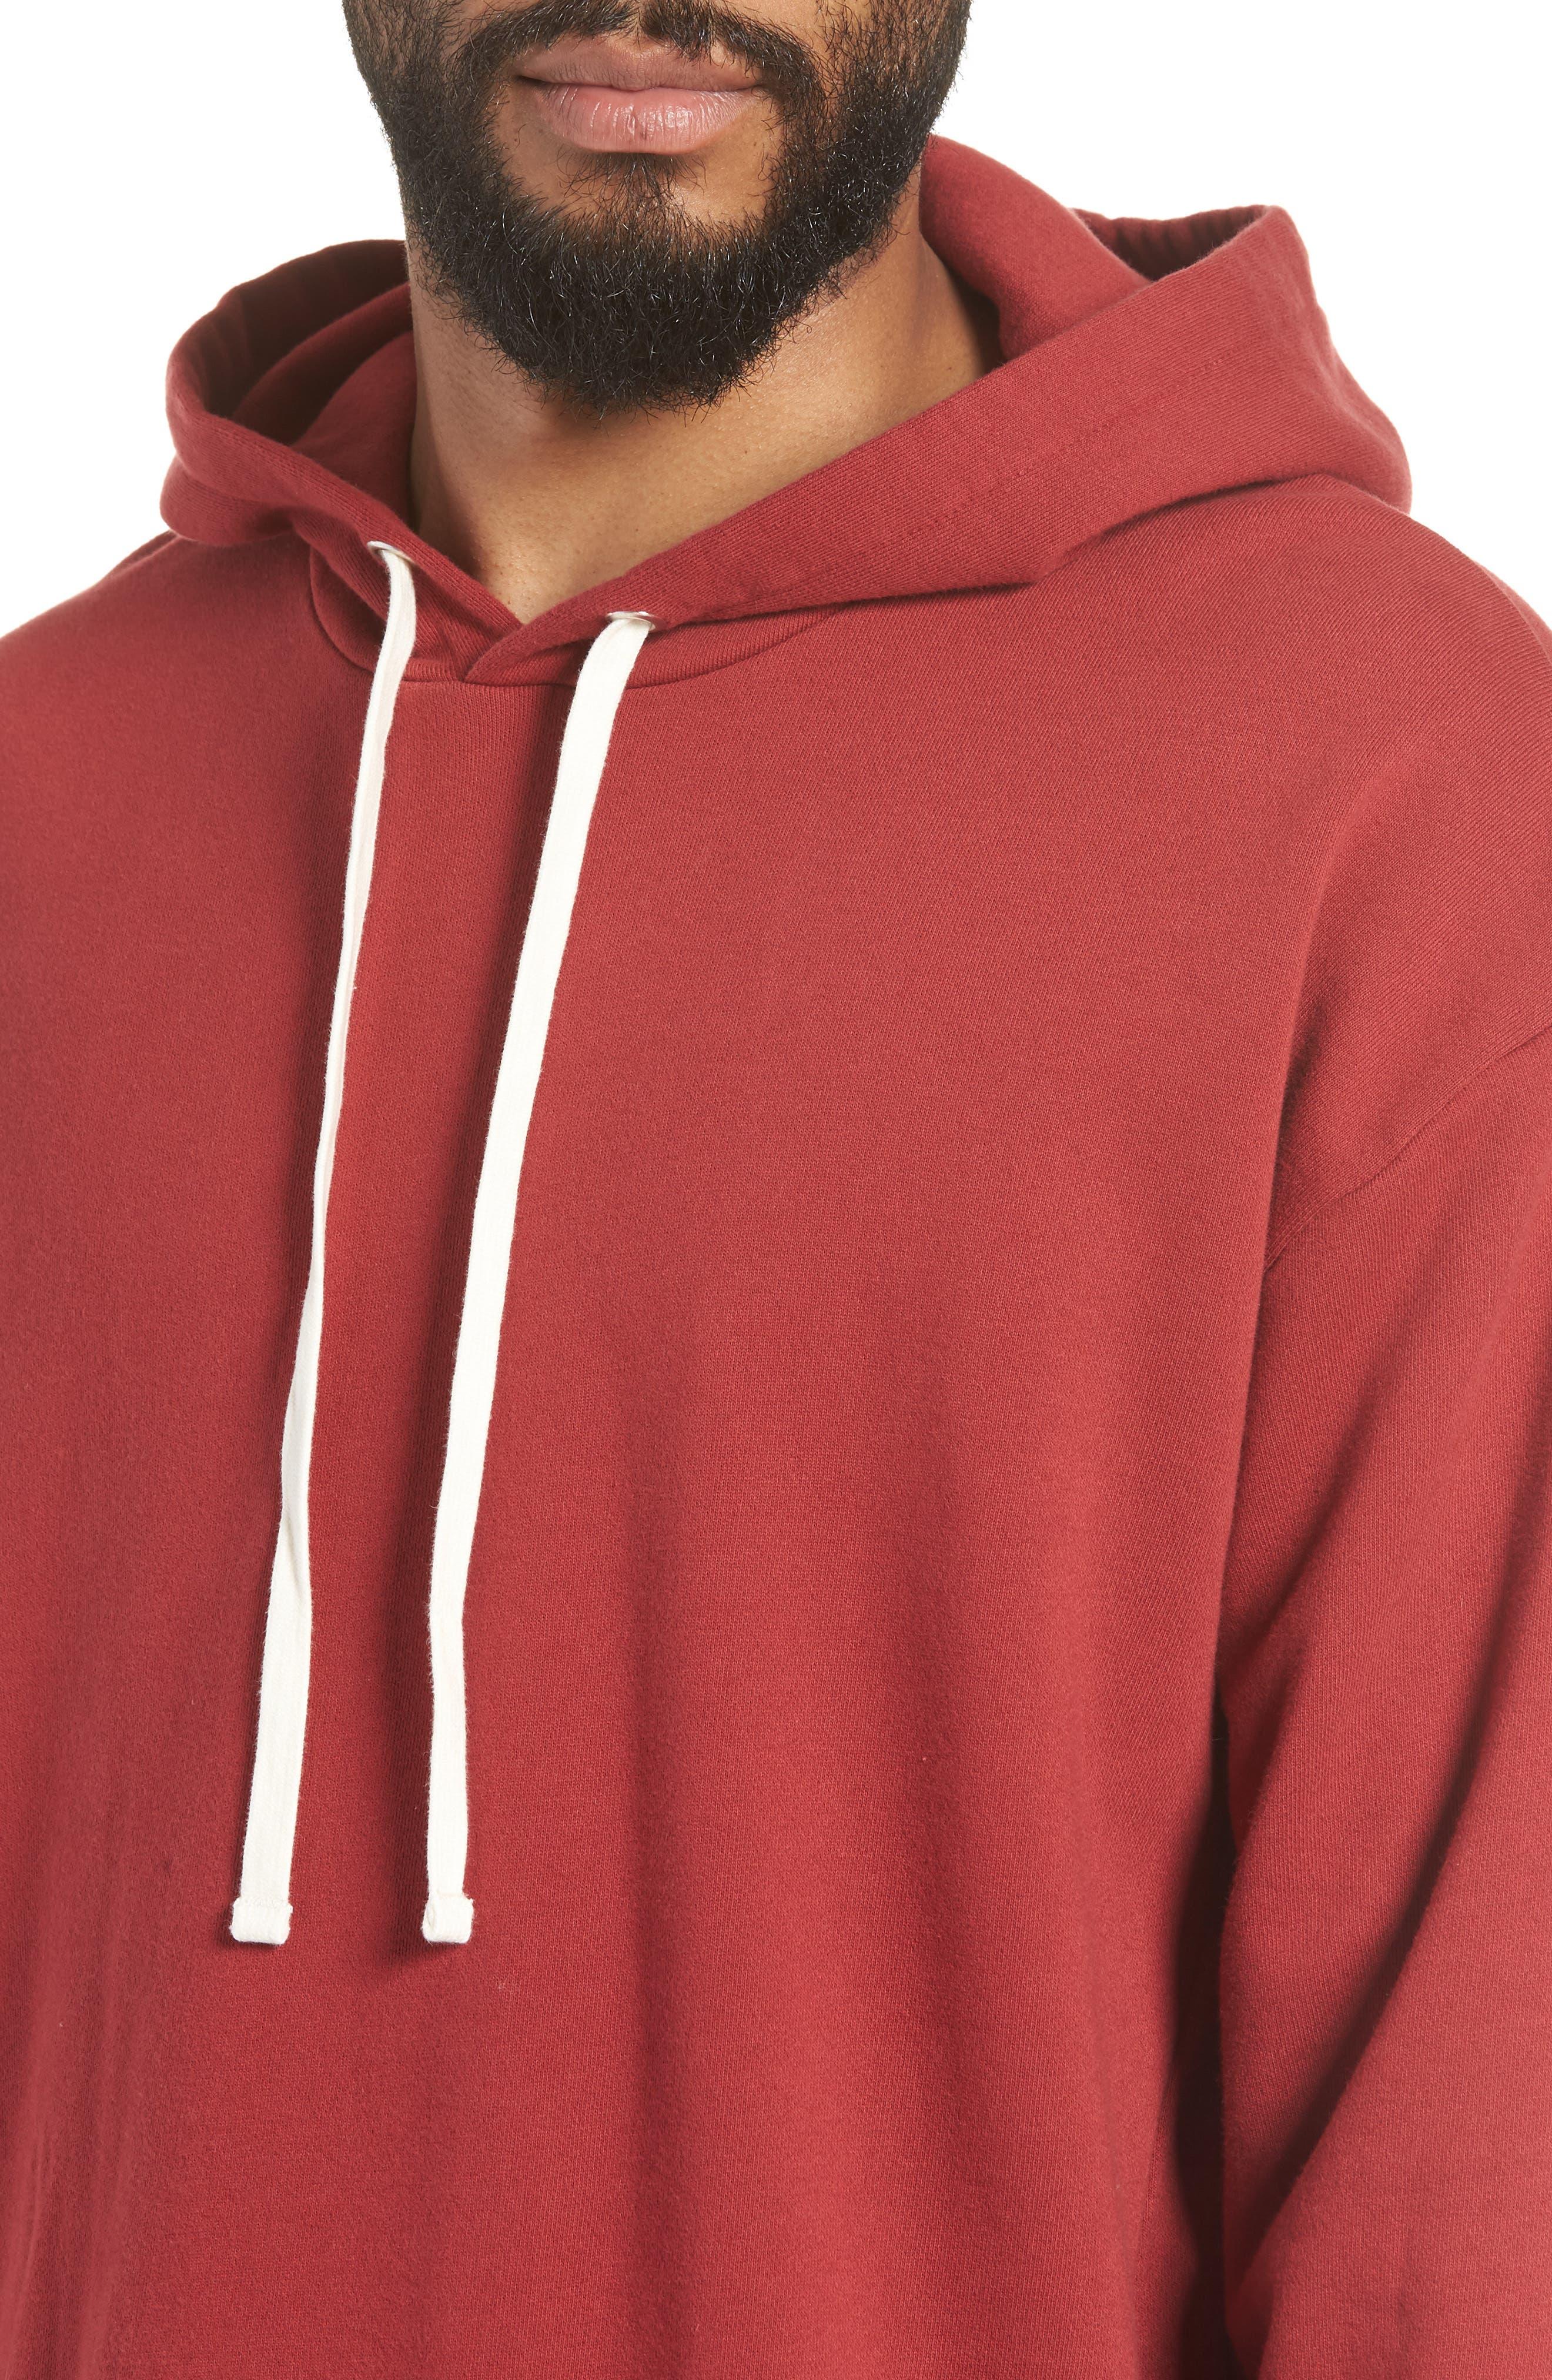 Rugger Hooded Sweatshirt,                             Alternate thumbnail 3, color,                             Dark Cherry